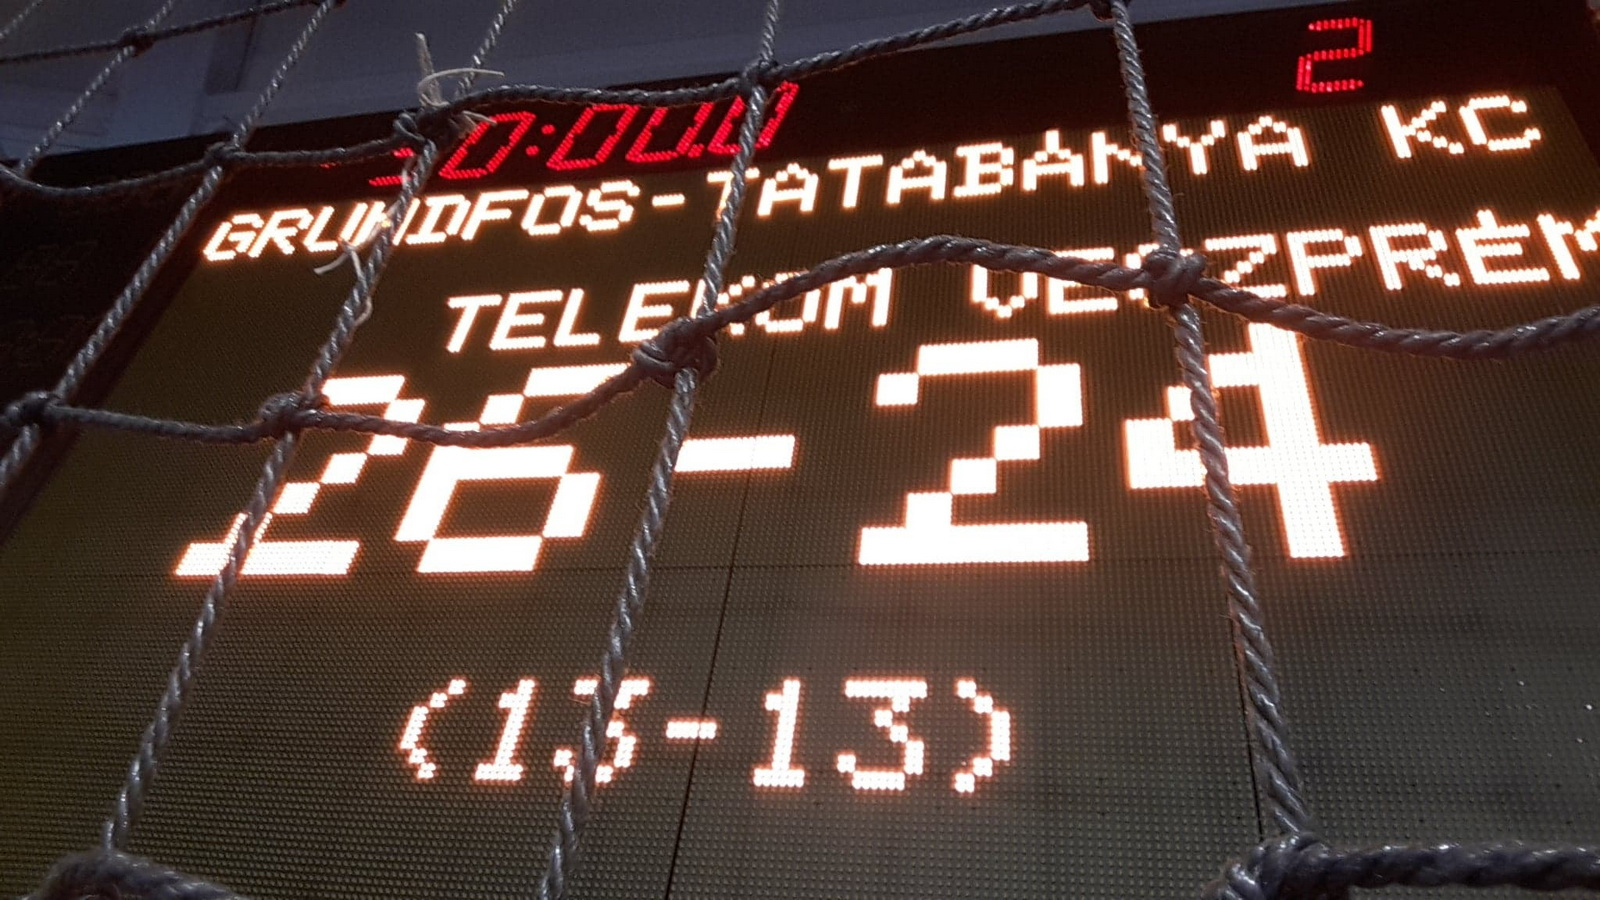 grundfos-tatabanya-telekom-veszprem-26-24-sbs-2018-img-02